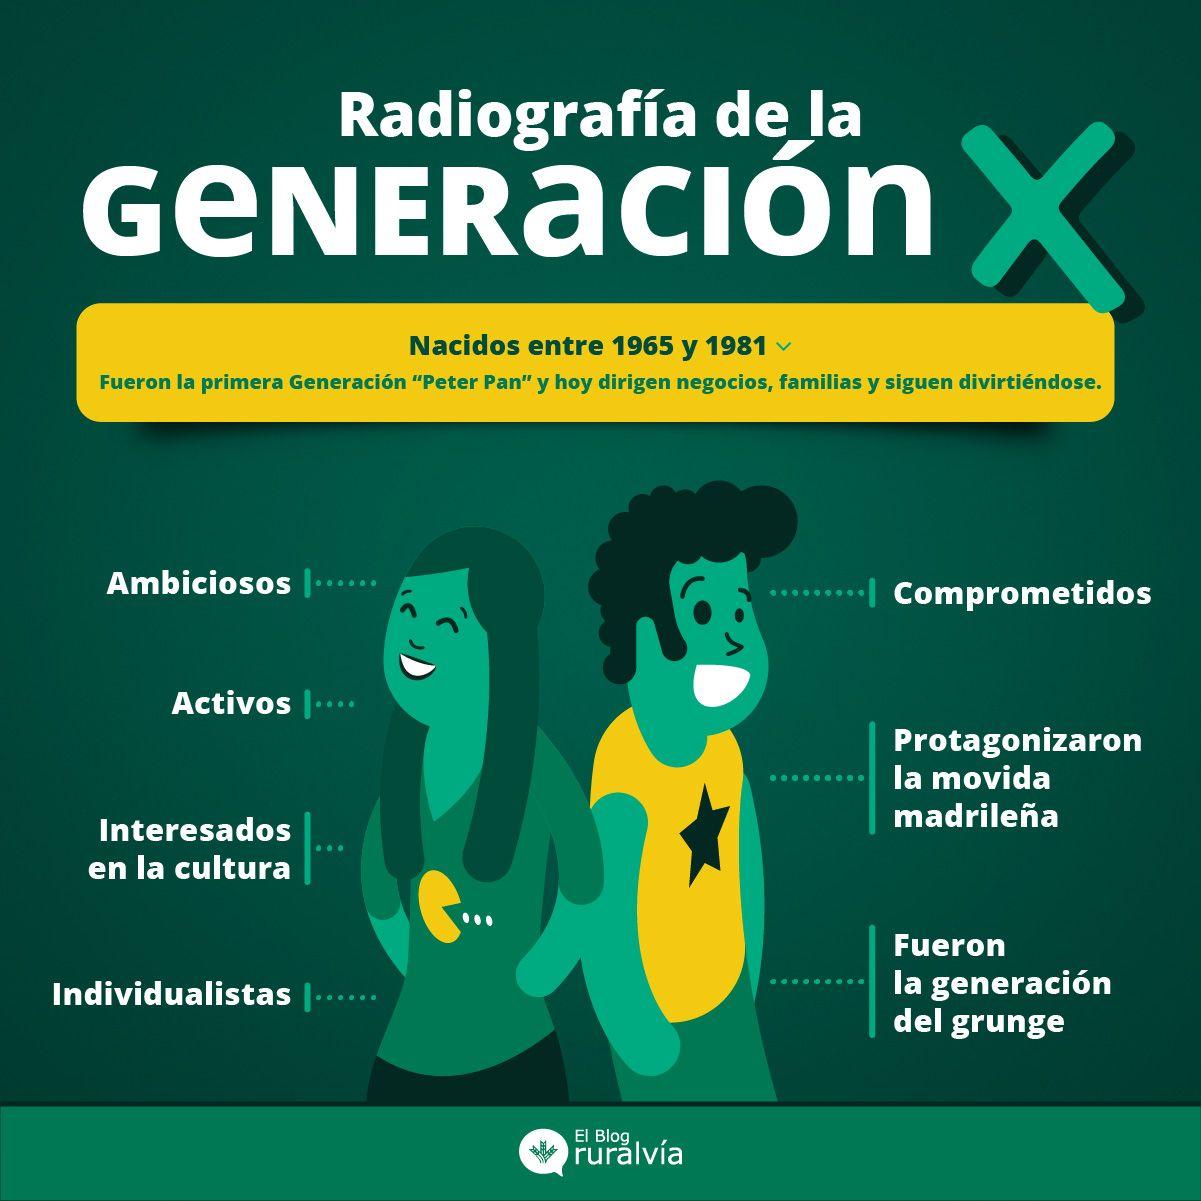 generacion x